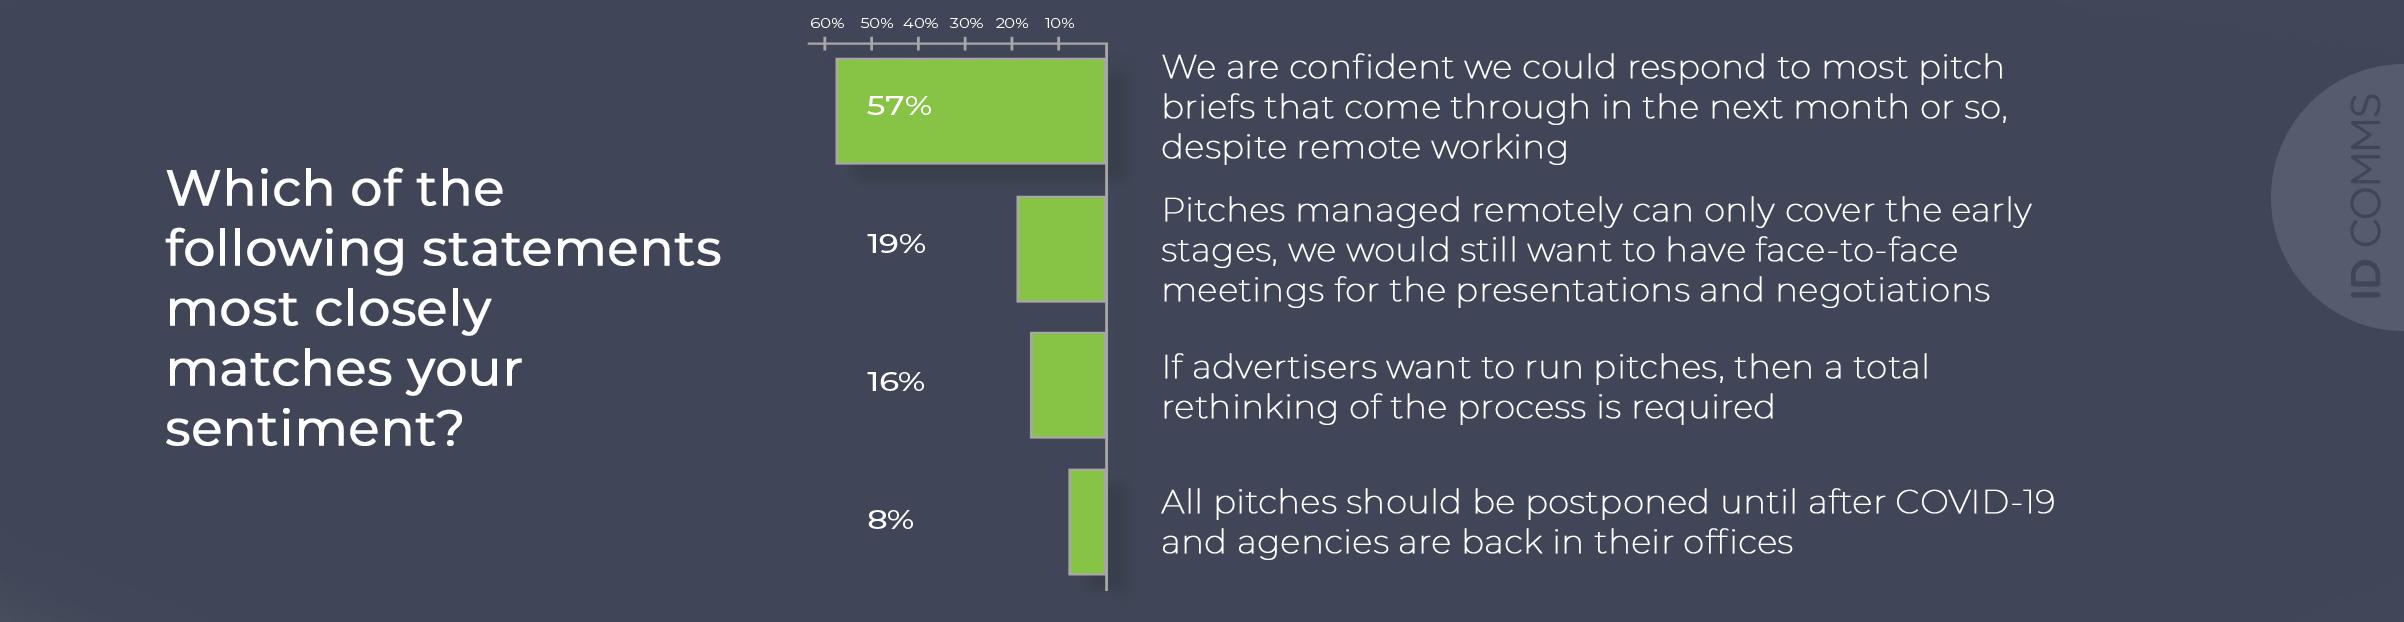 ID Comms CEO survey question 2